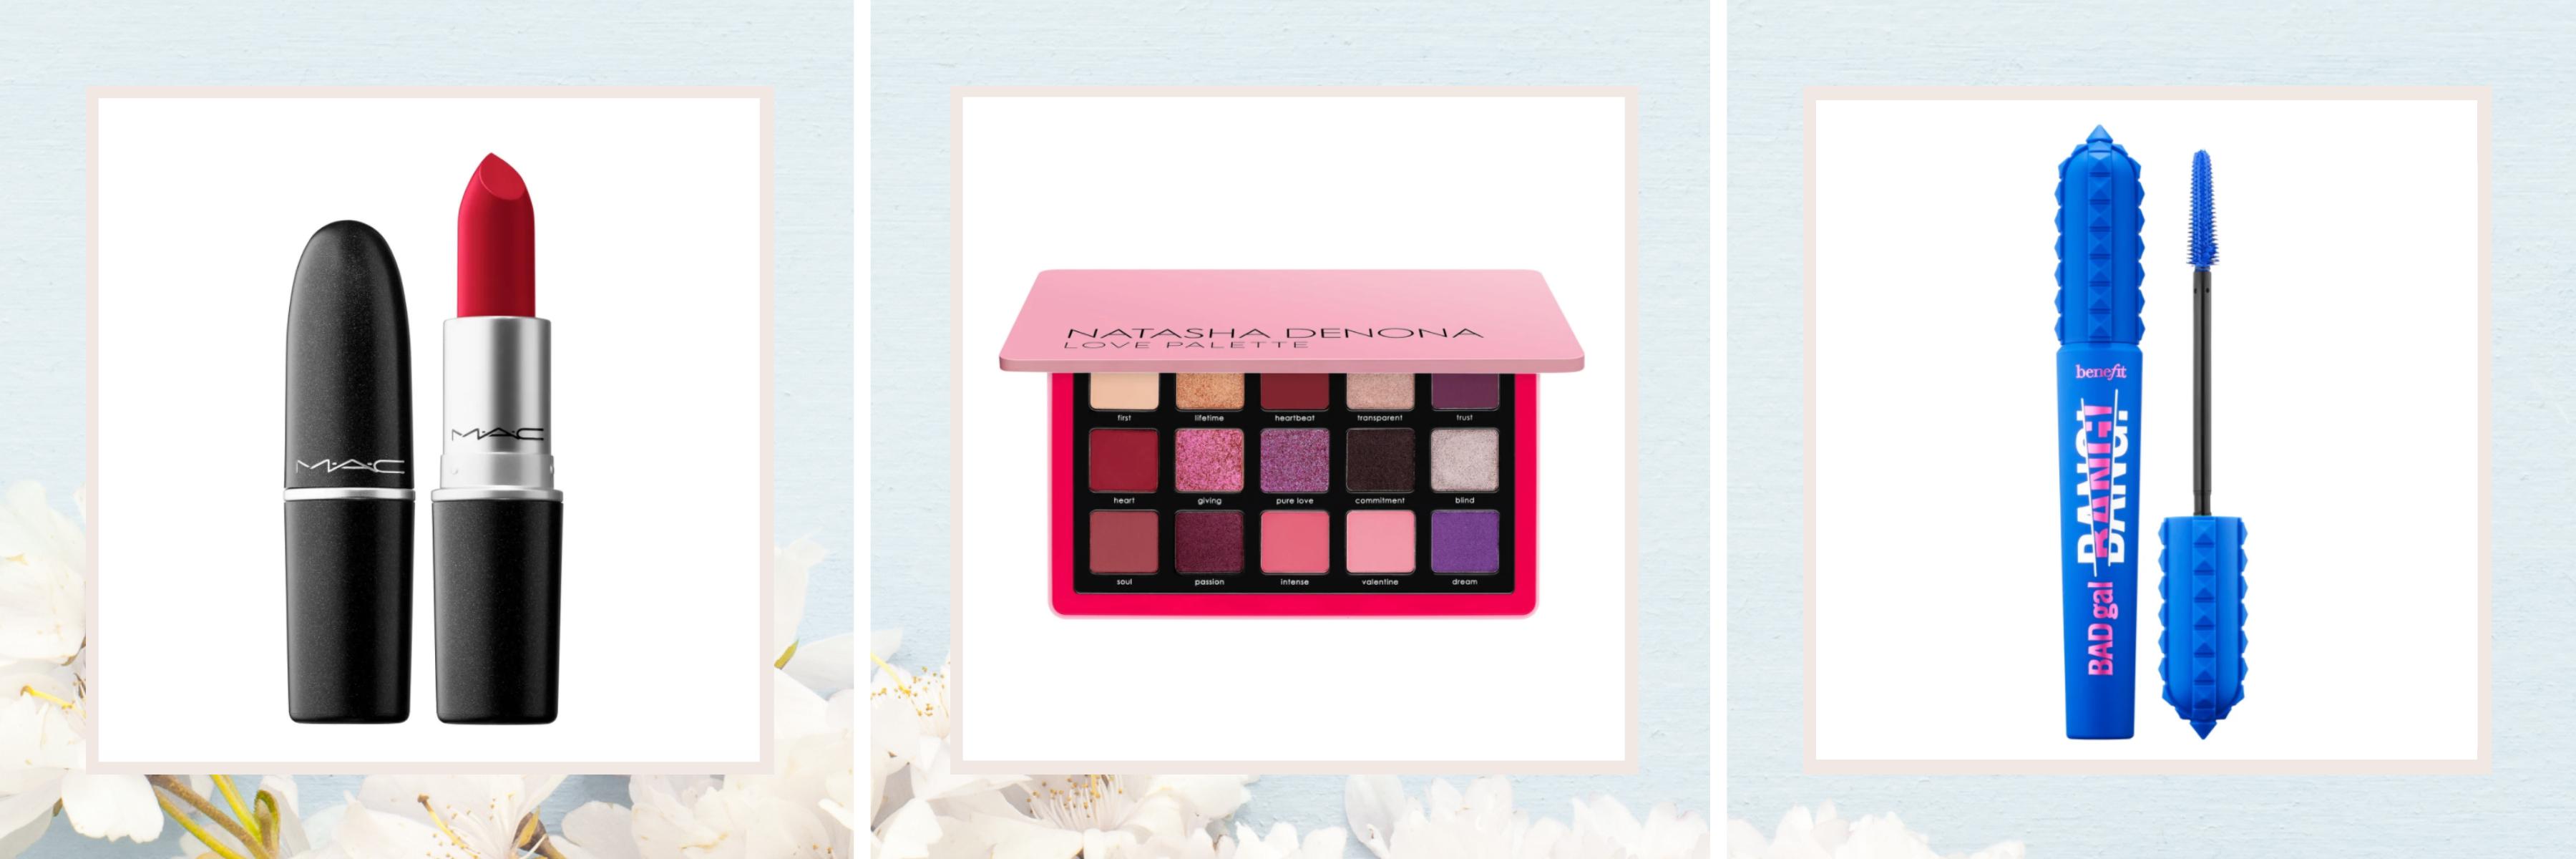 Lipstick, Eyeshadow Palette & Mascara